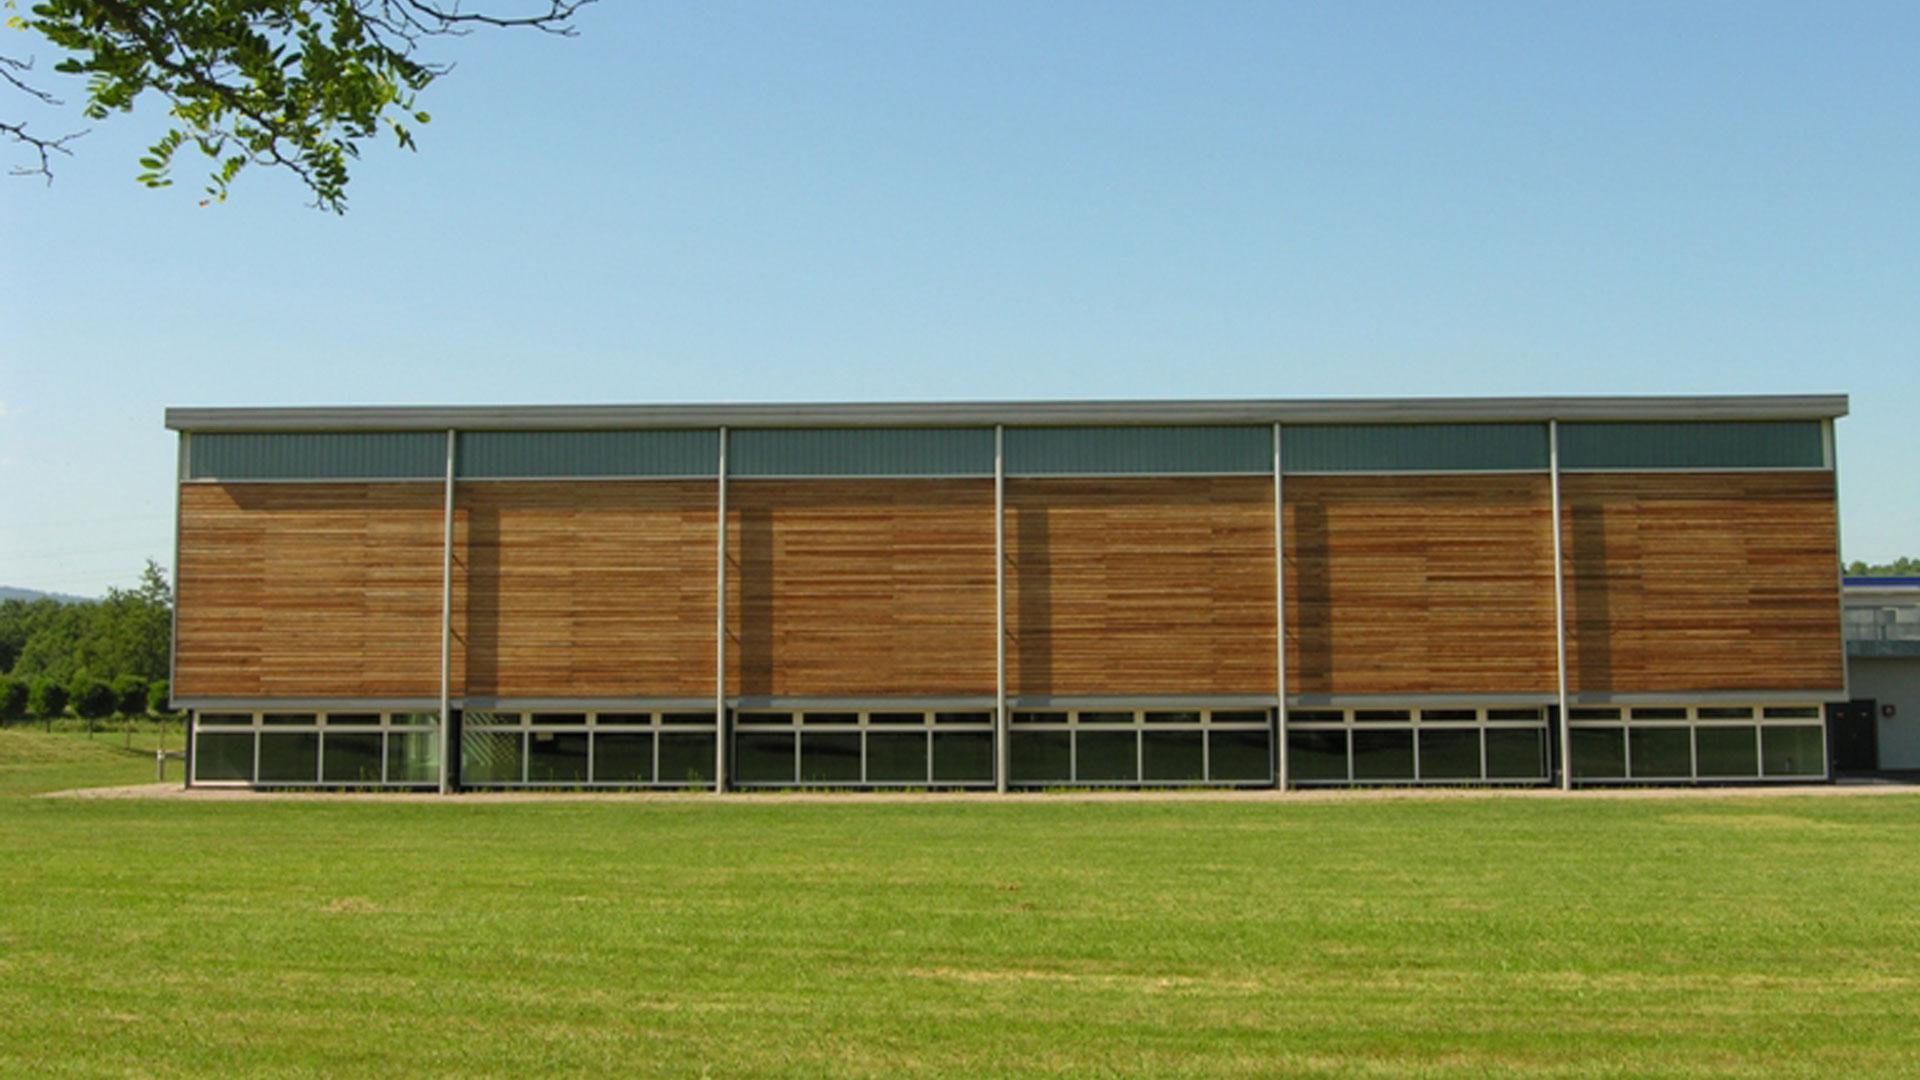 centre sportif et culturel Gresswiller-Dinsheim-sur-Bruche - photo PSA